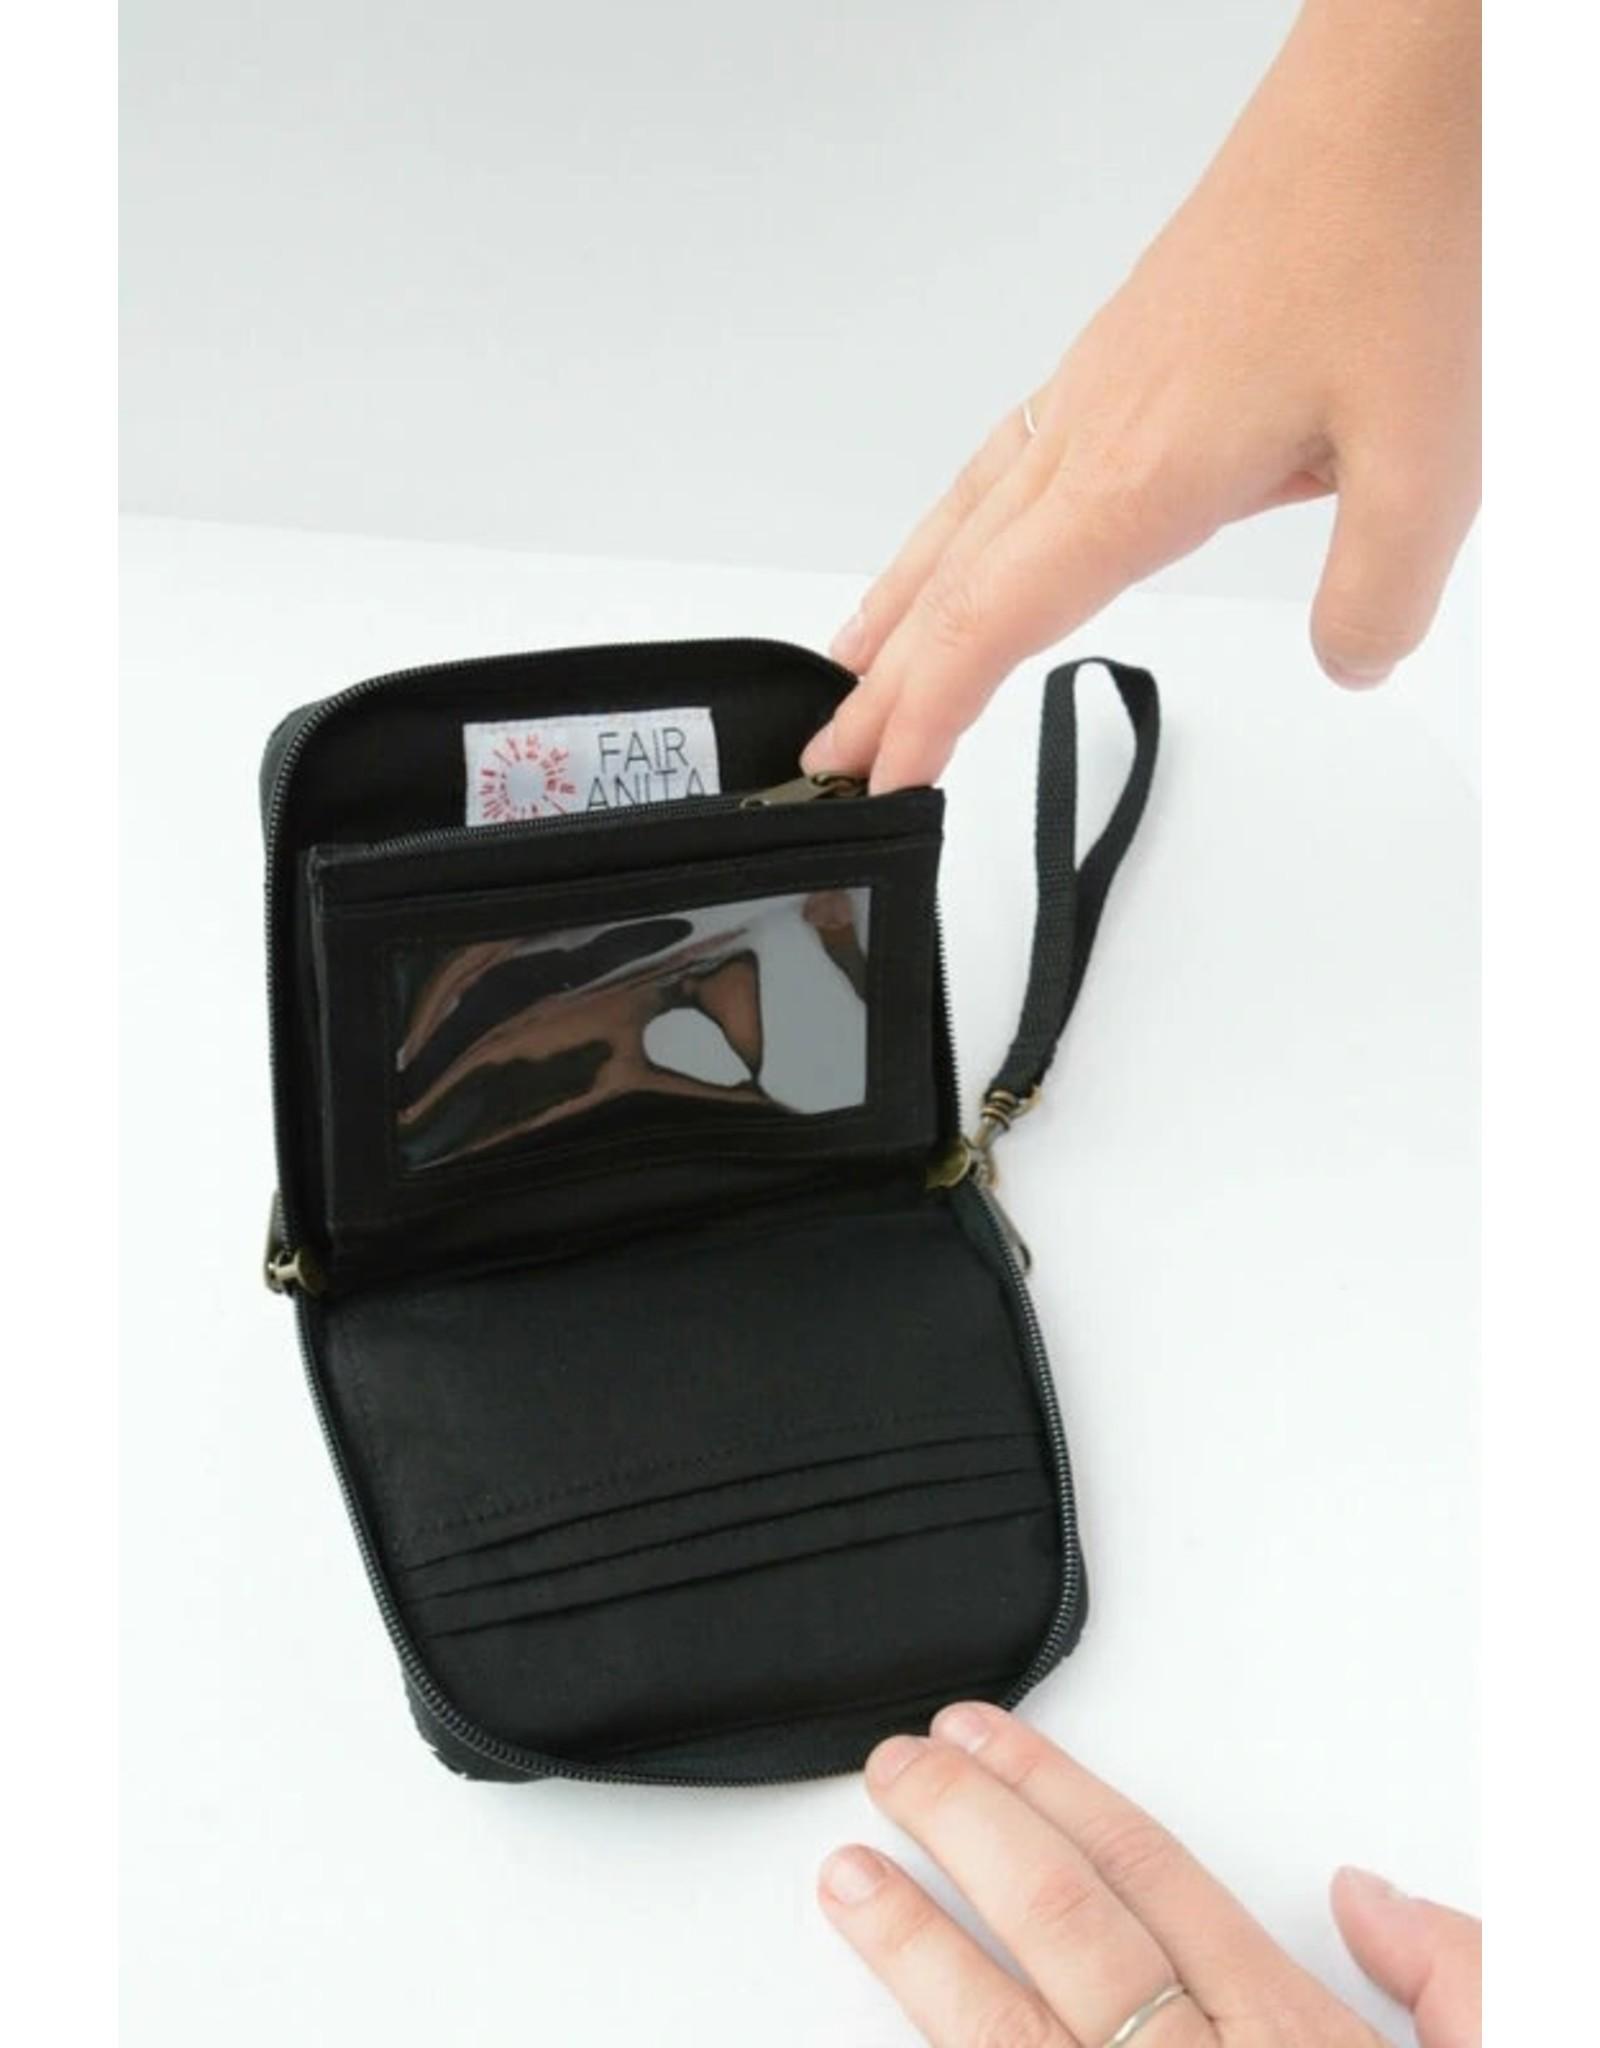 Fair Anita Pick Up Sticks Mini Zip Wallet, Cambodia